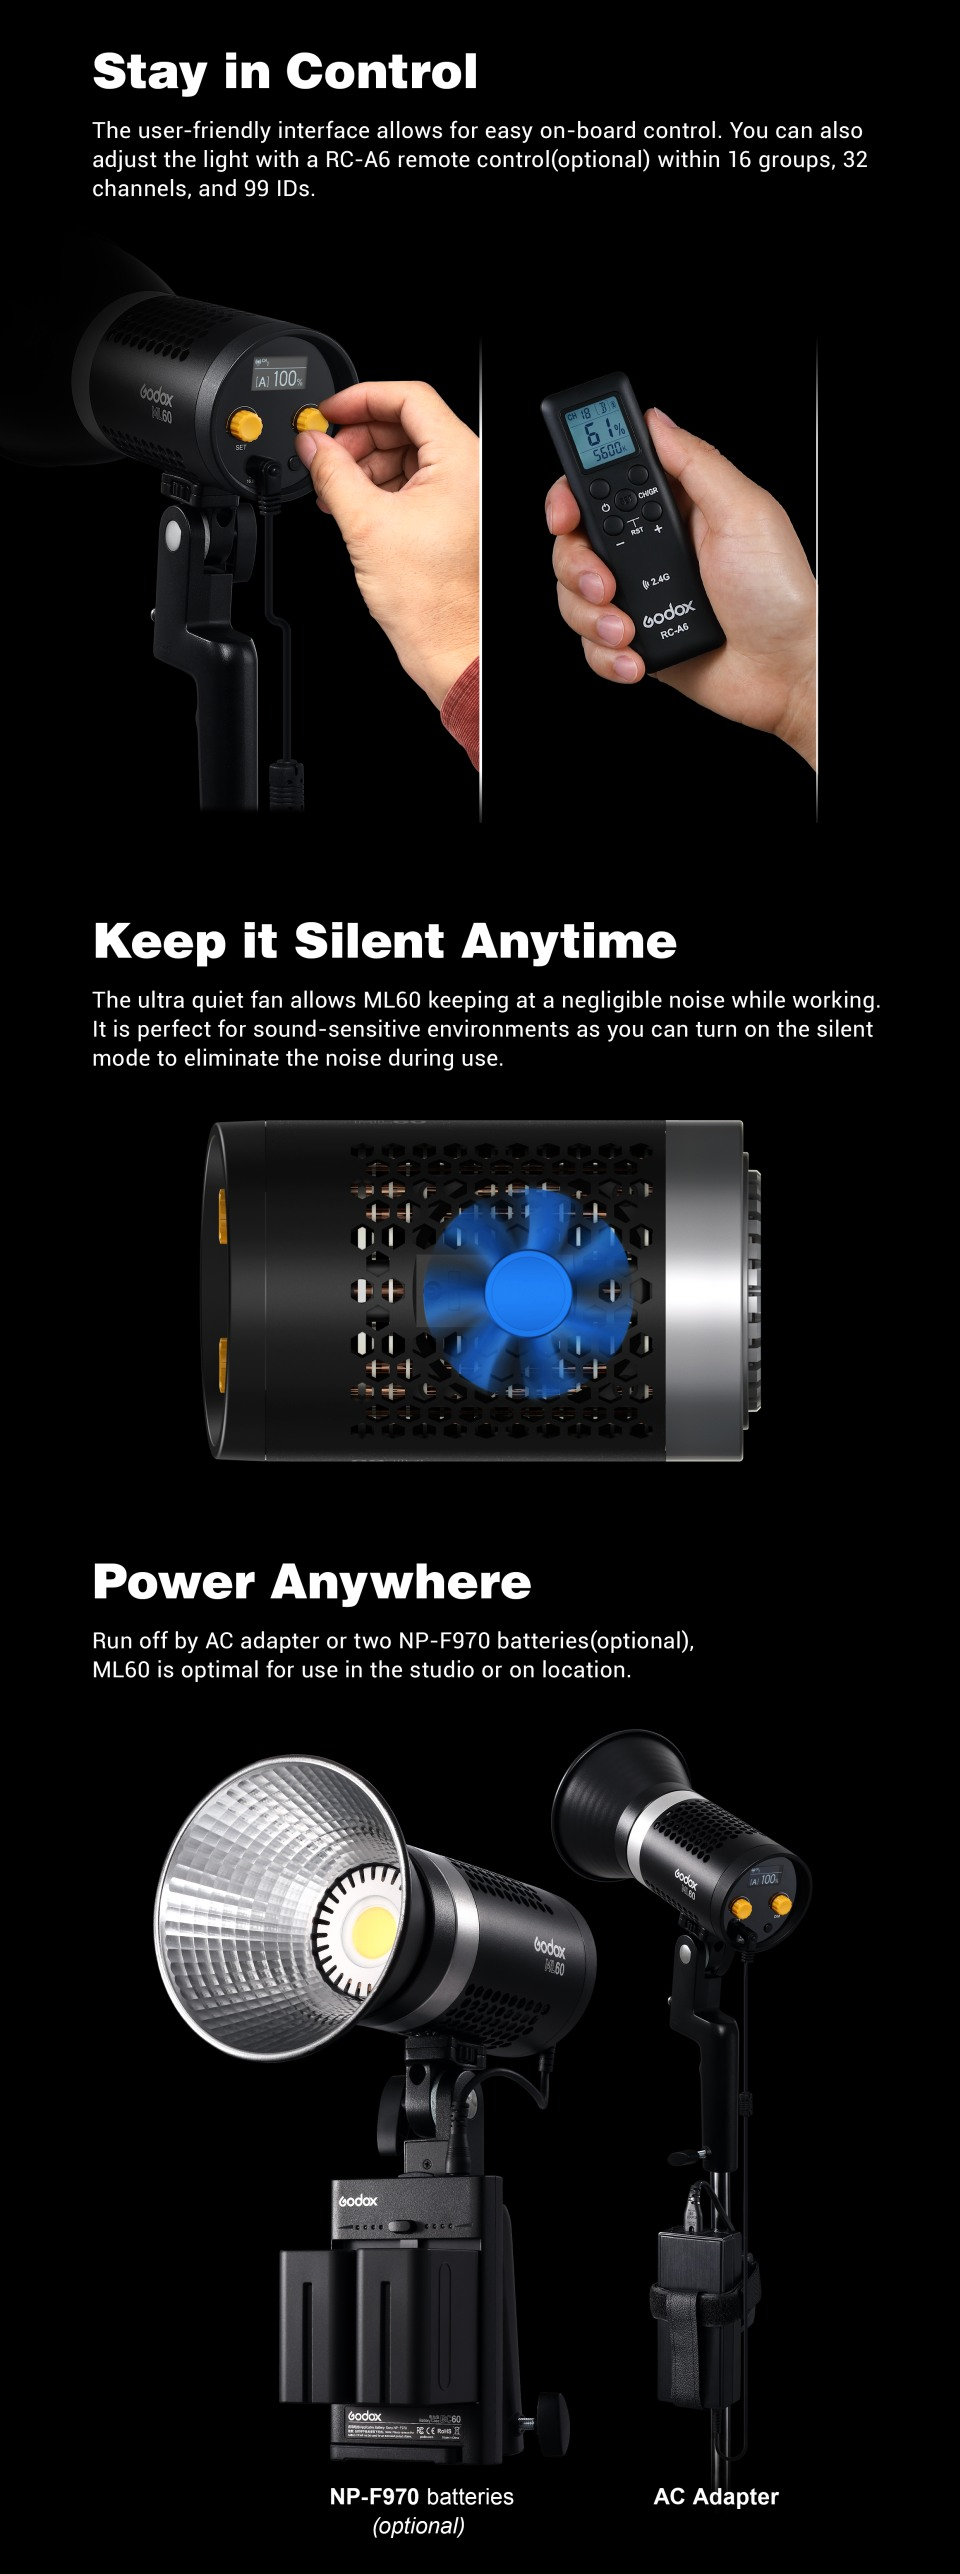 Control panel, Radio Control, Silient Fan, Battery Options. Godox ML60.